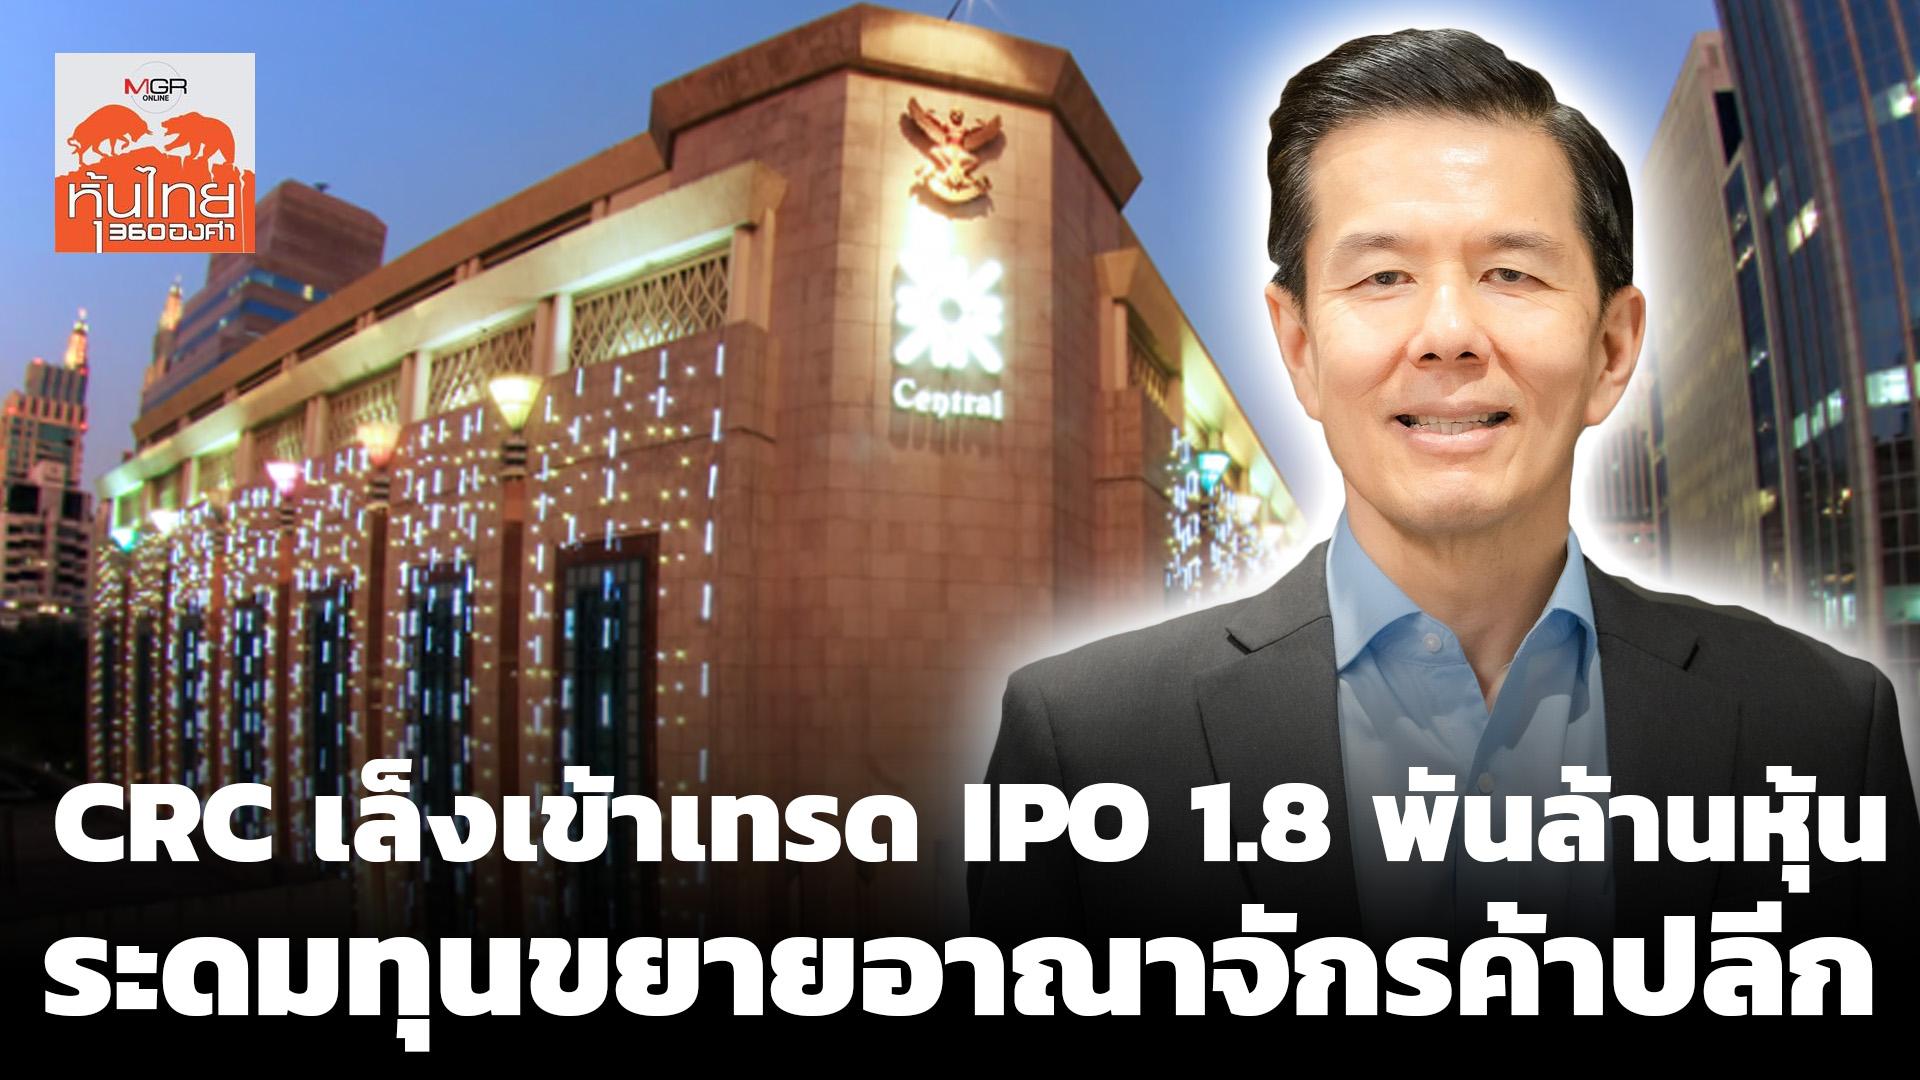 CRC เล็งเข้าเทรด IPO 1.6 พันล้านหุ้น ระดมทุนขยายอาณาจักรค้าปลีก